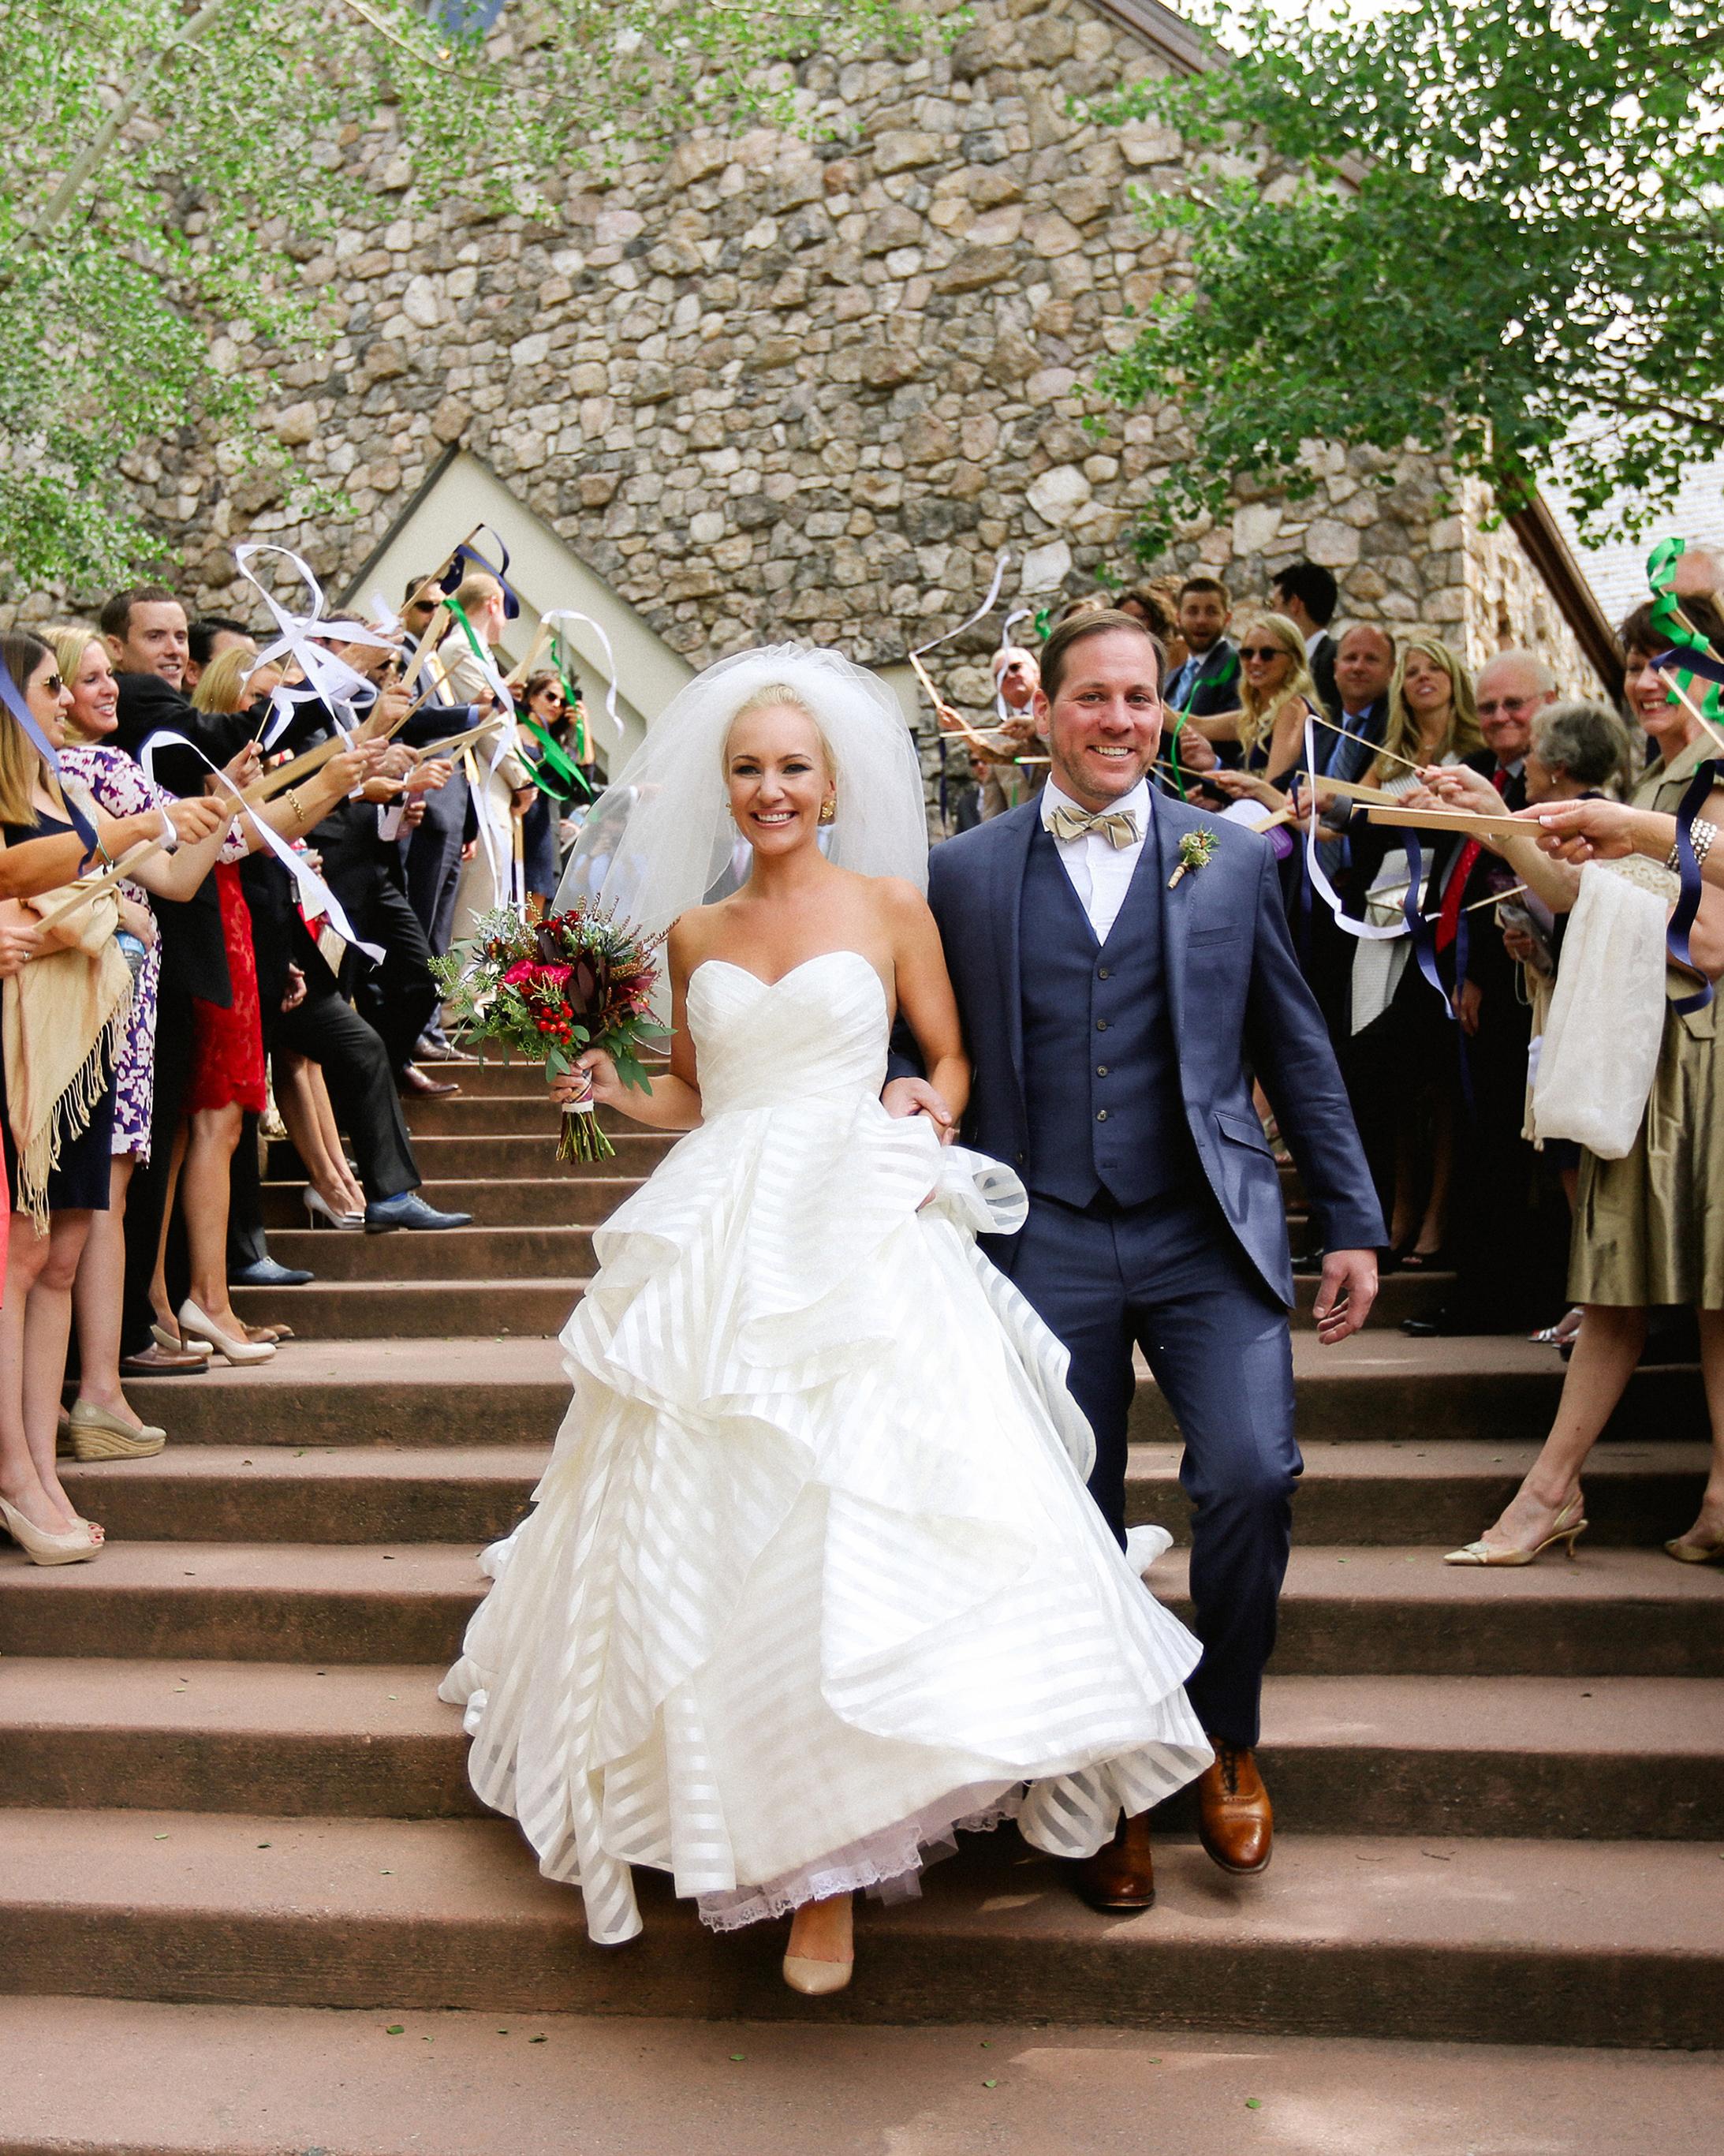 stacey-eric-wedding-exit-358-s111513-1014.jpg